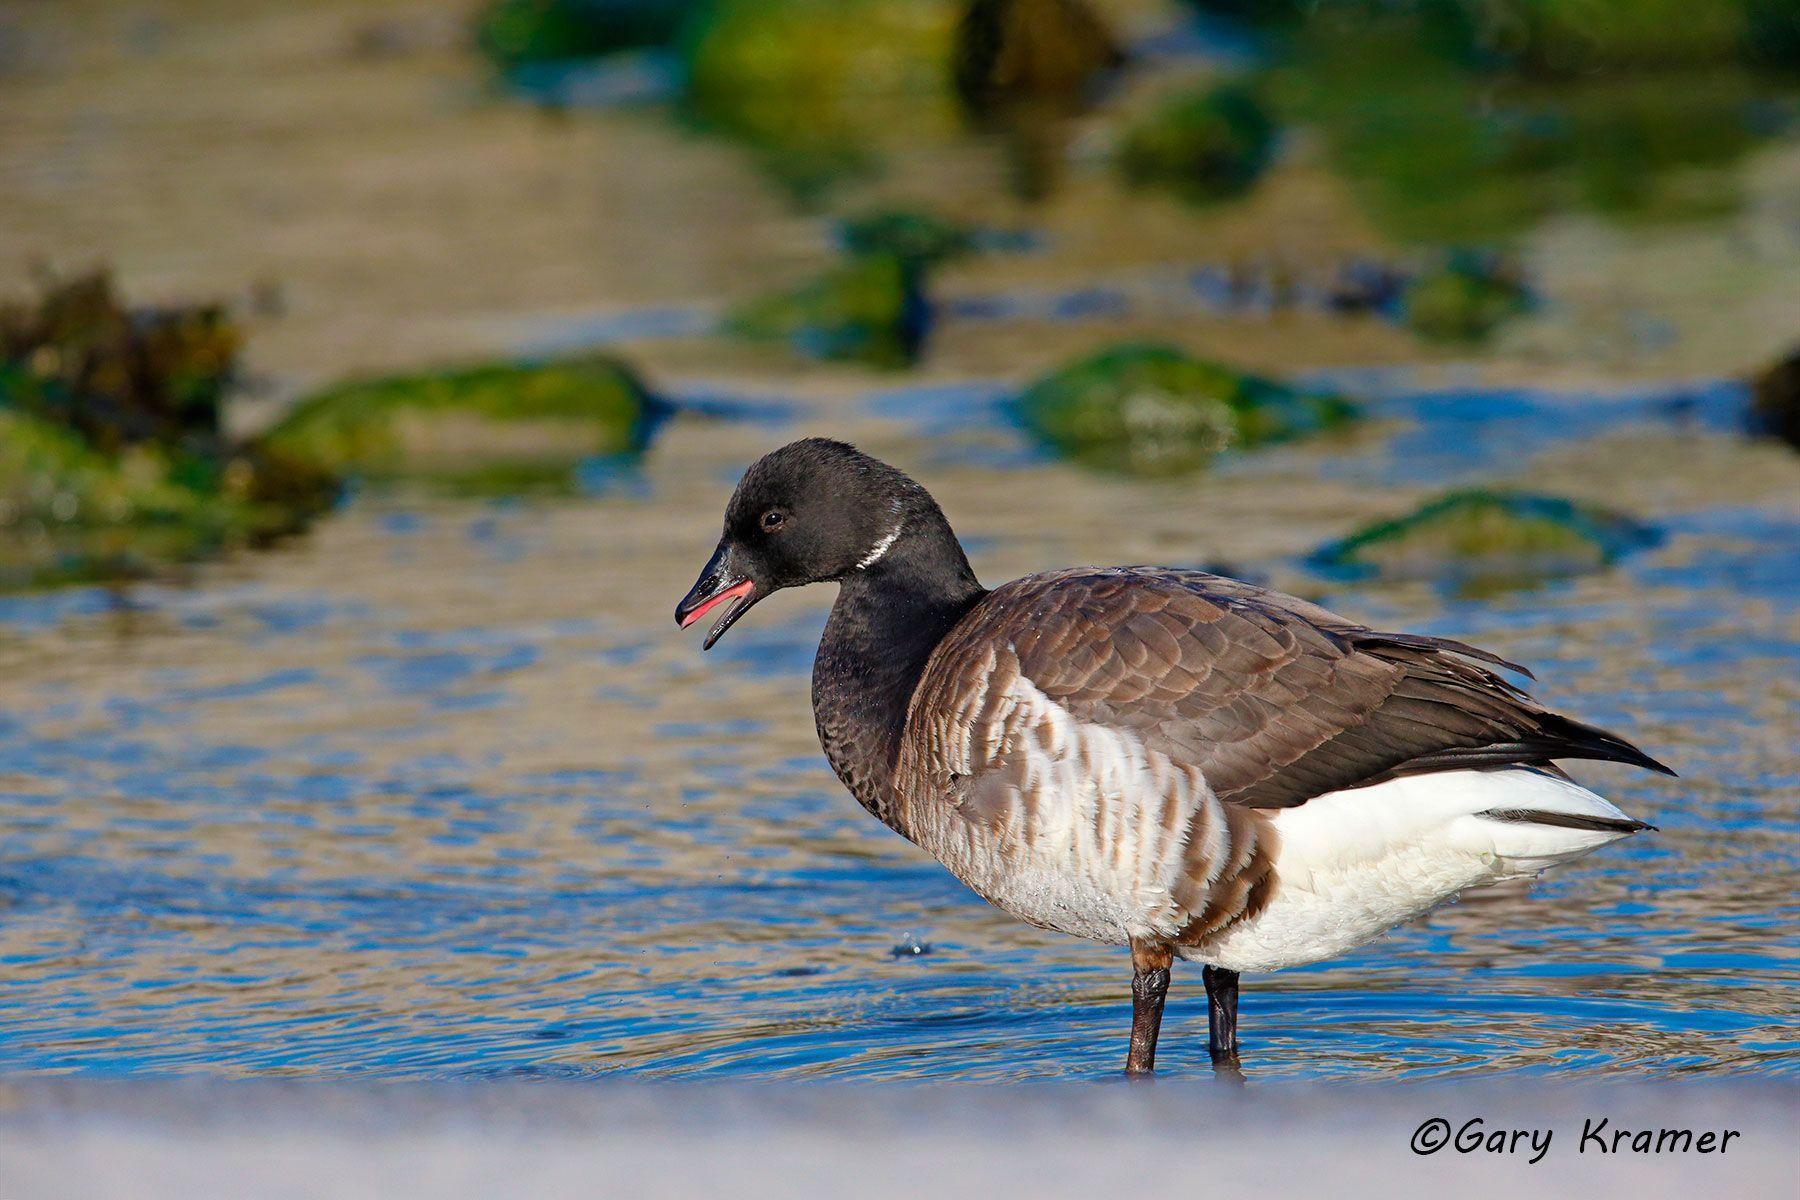 Pale-bellied (Atlantic) Brant (Branta bernicla hrota) - NBWBa#337d